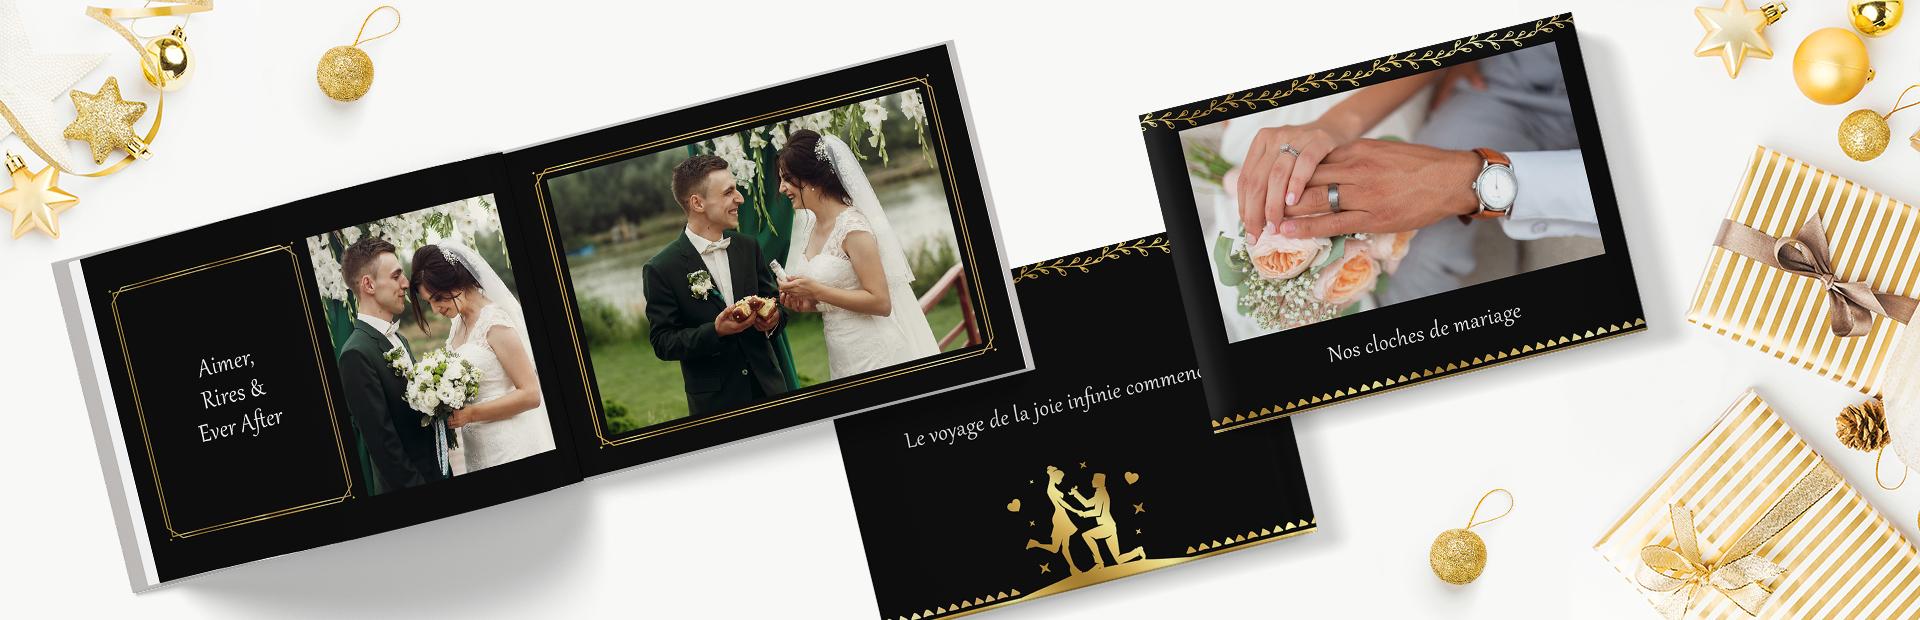 Gilded Wedding Photo Books Online